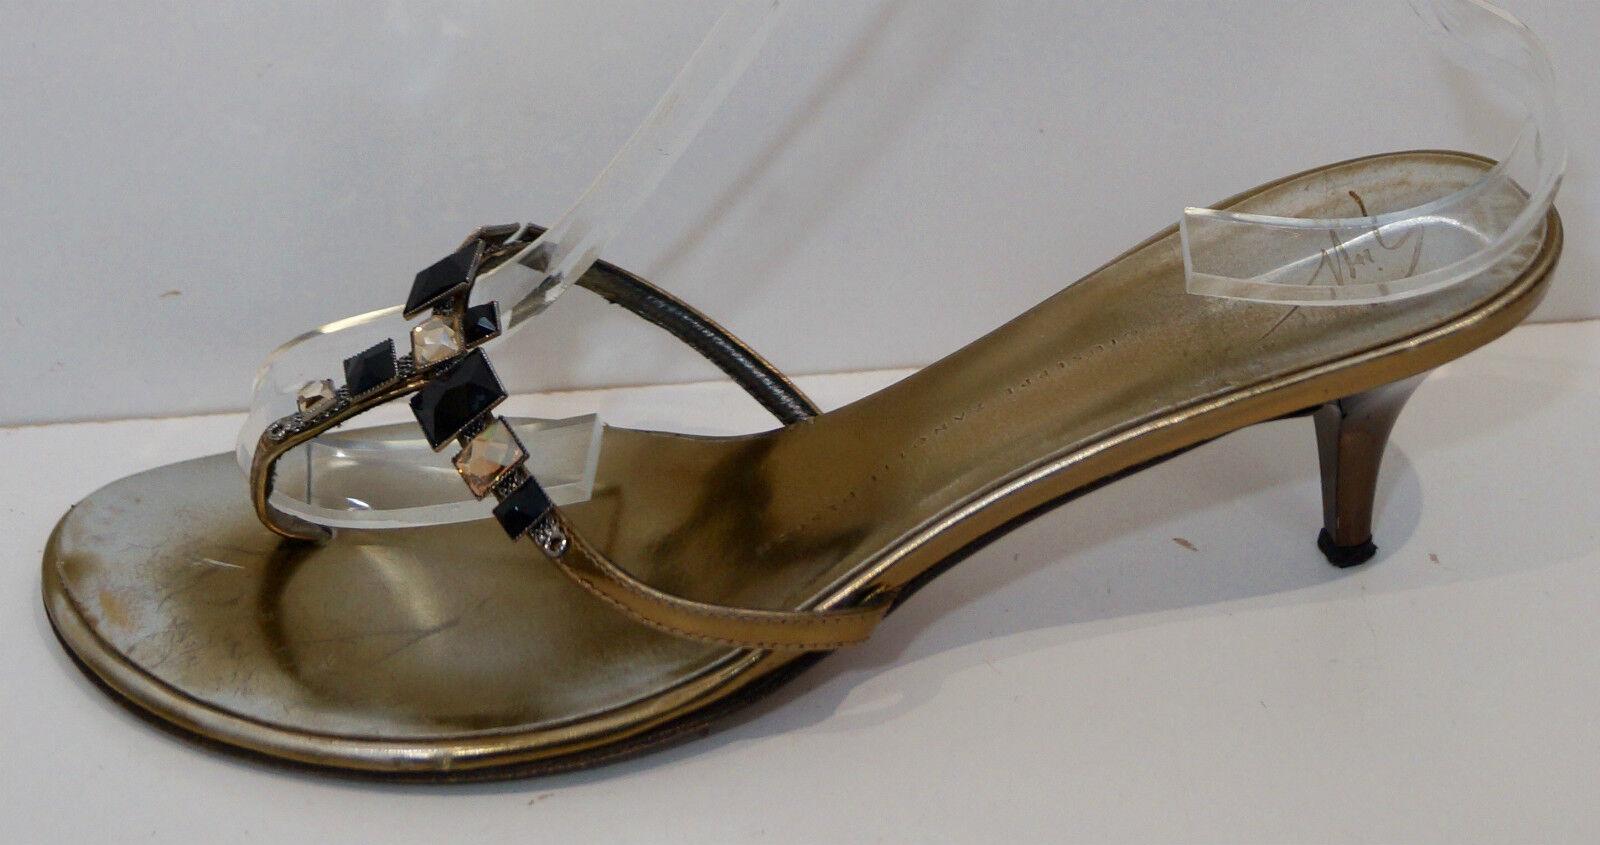 GIUSEPPE ZANOTTI DESIGN DESIGN ZANOTTI Gold Metallic Leather Diamante Thong Sandals 40; UK7 a1afca